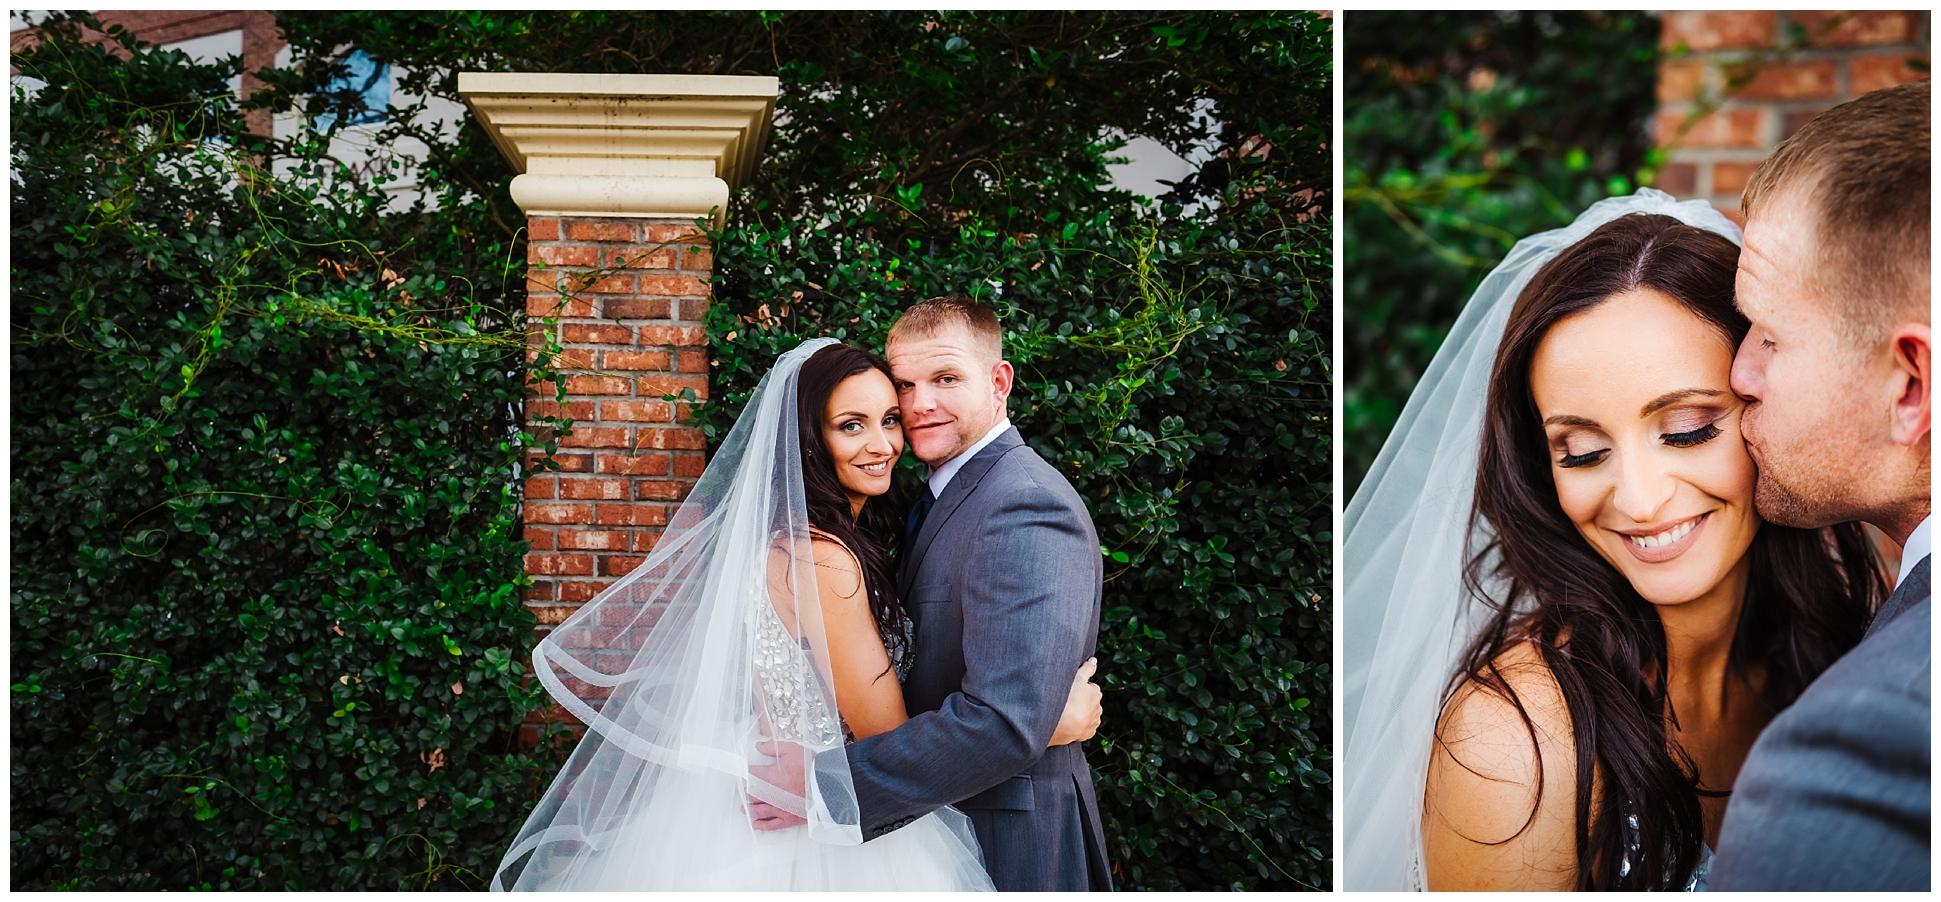 tampa-wedding-photographer-oxford-exchange-garland-candlelight-gold-hayley-paige_0028.jpg